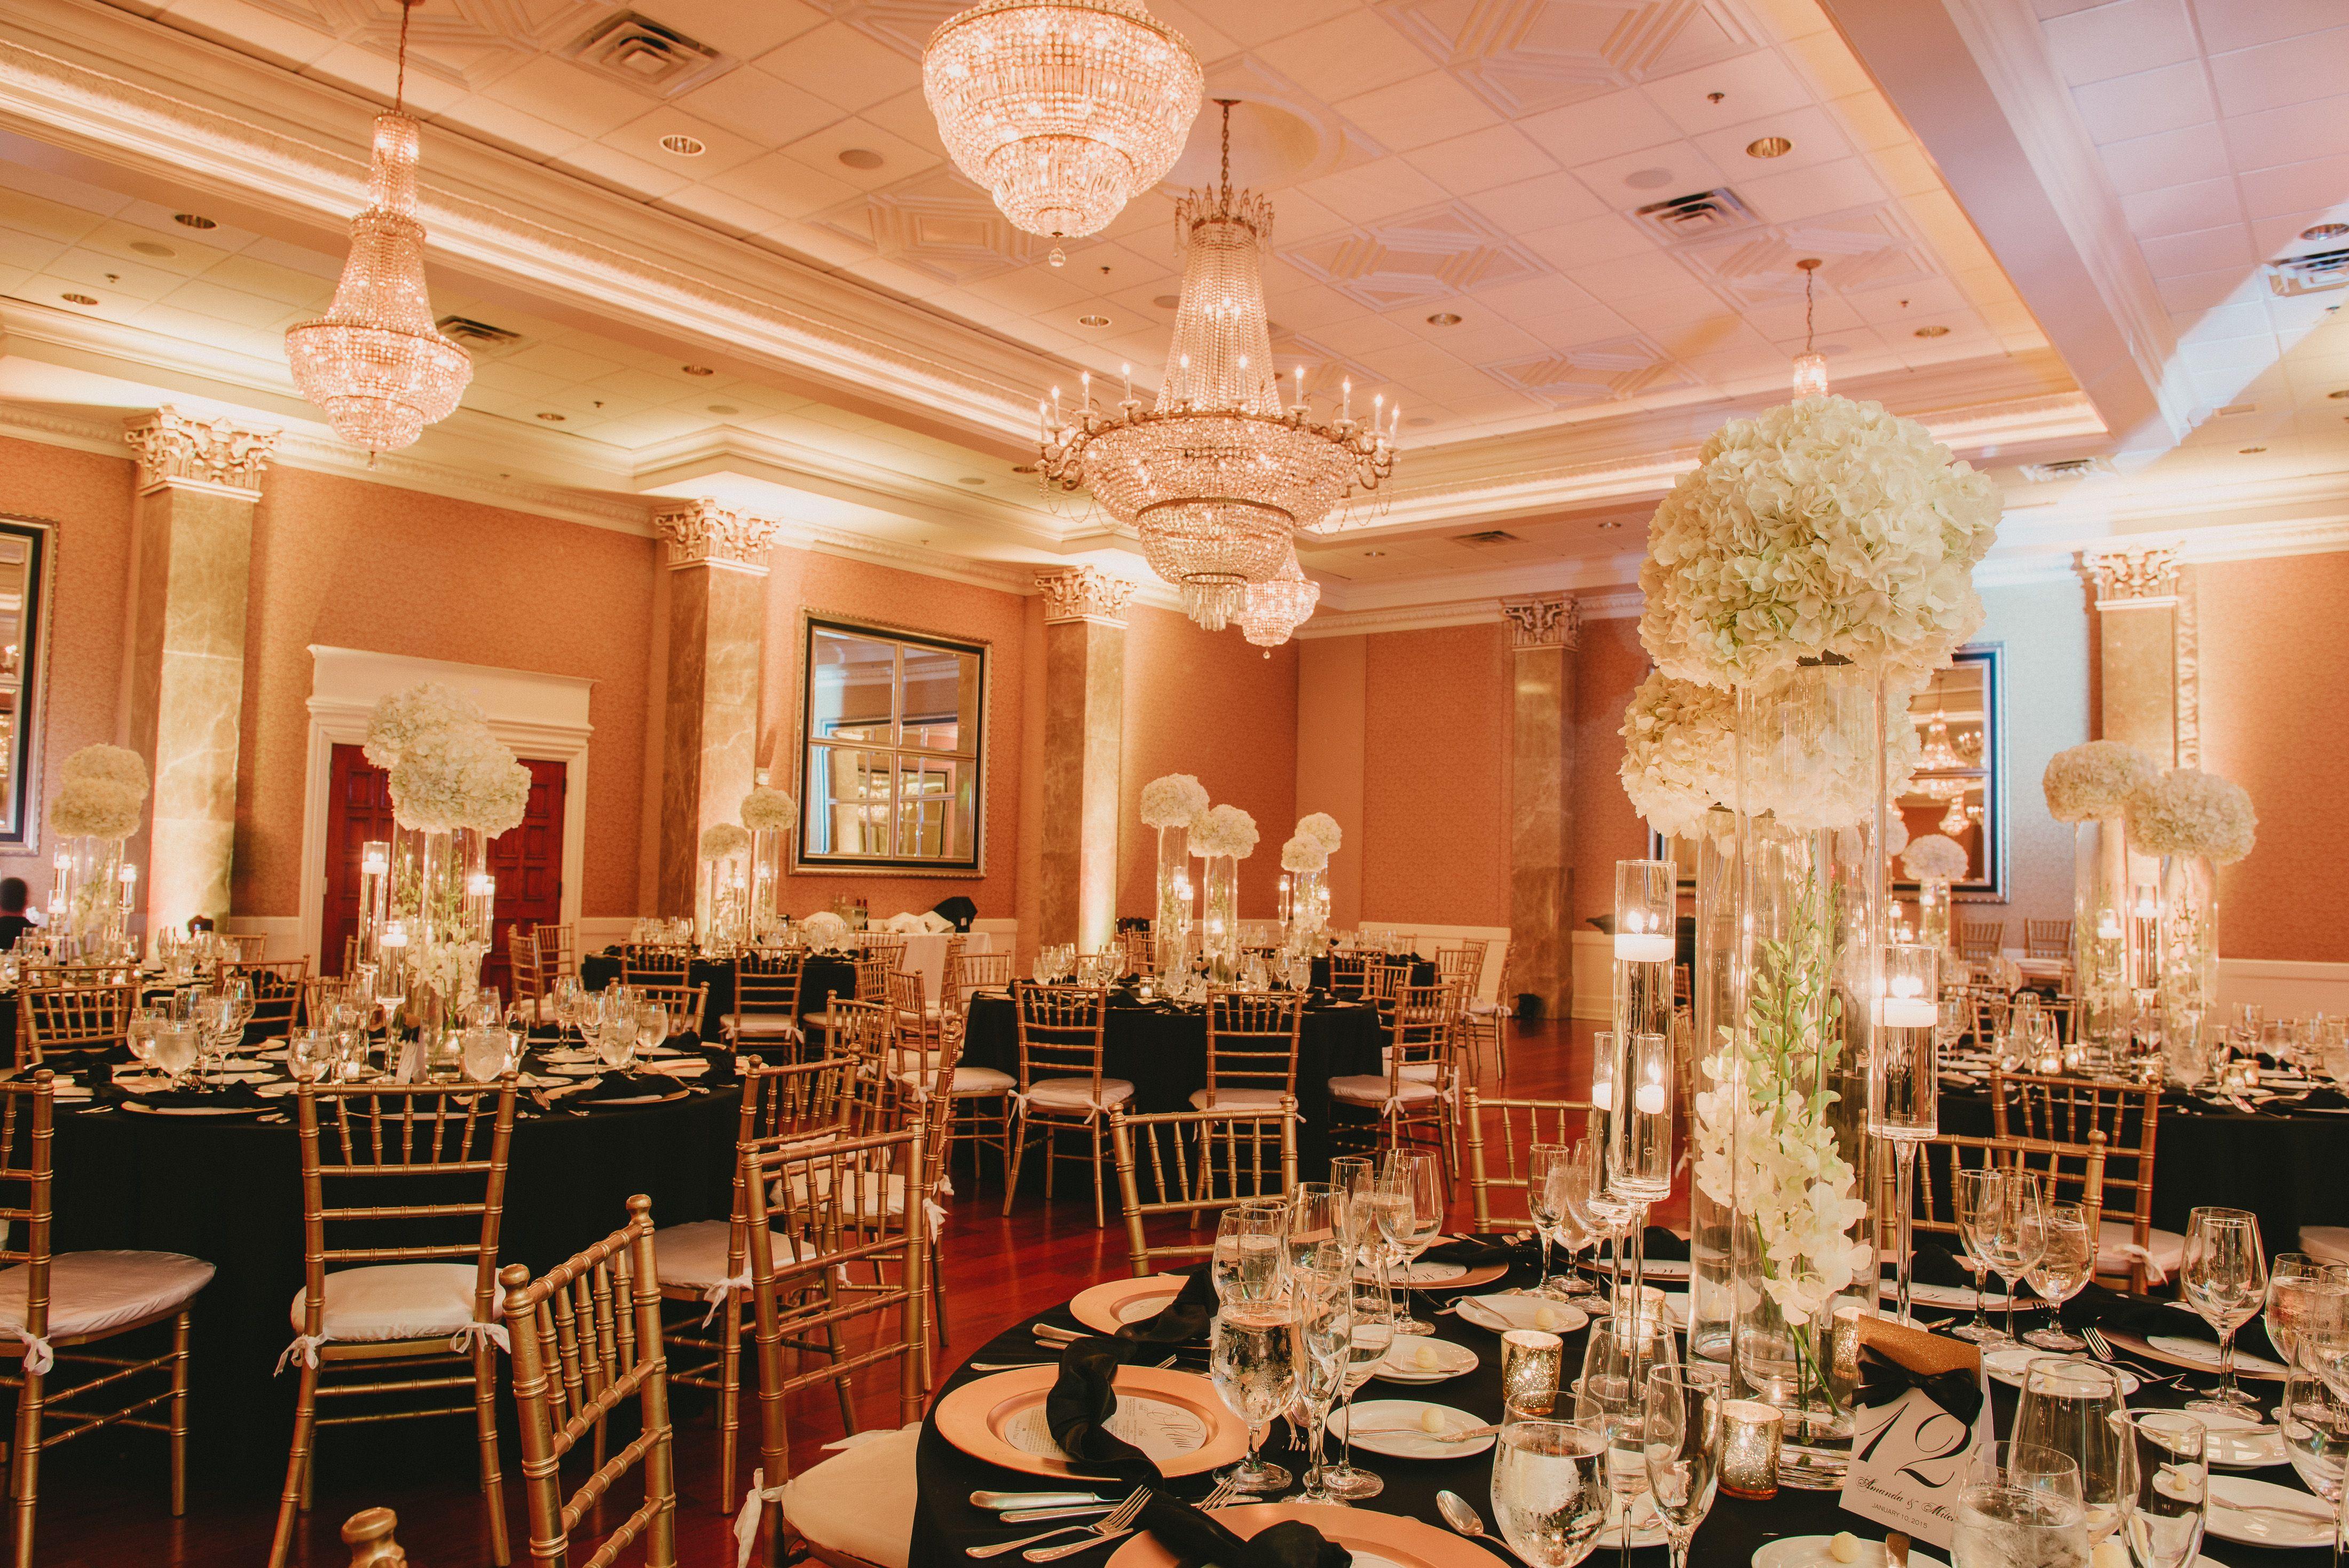 fe10a021e65613aeb1278bdb71ba51c0 - Halls For Rent In Miami Gardens